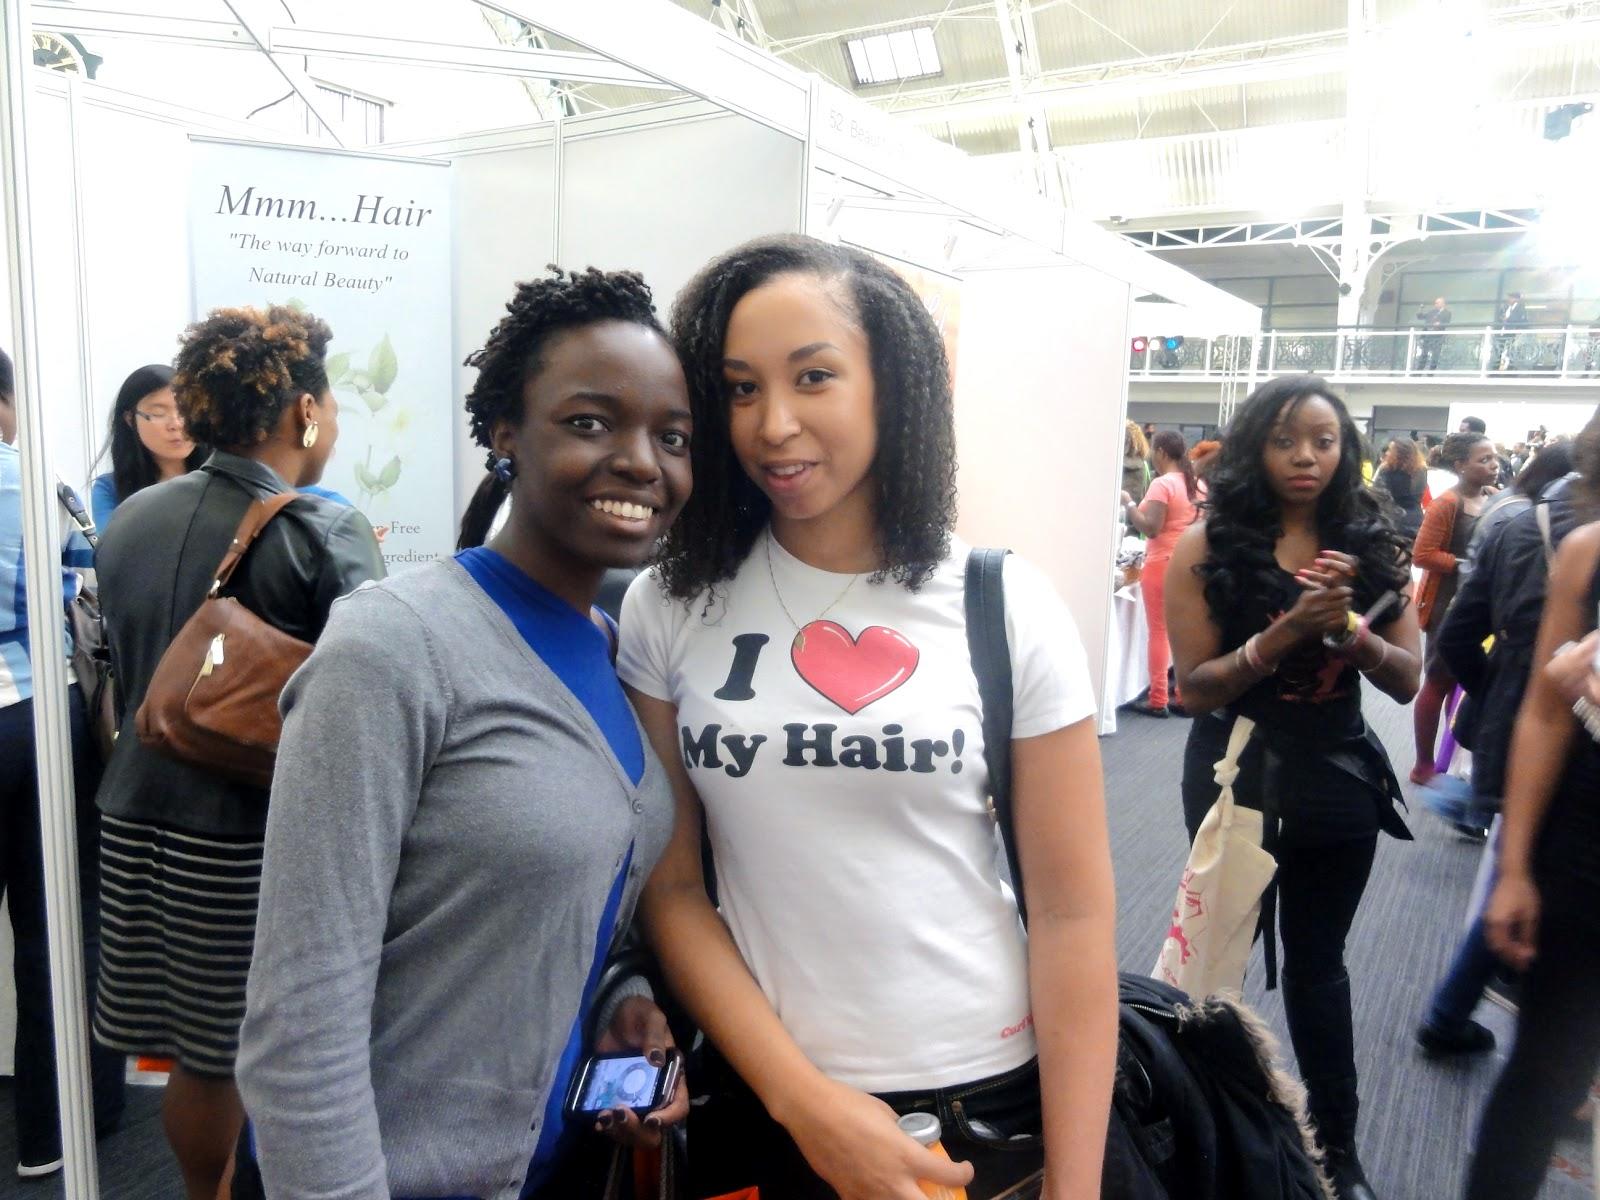 UNITED KinKdom: Afro Hair & Beauty (continued): June Jubilee